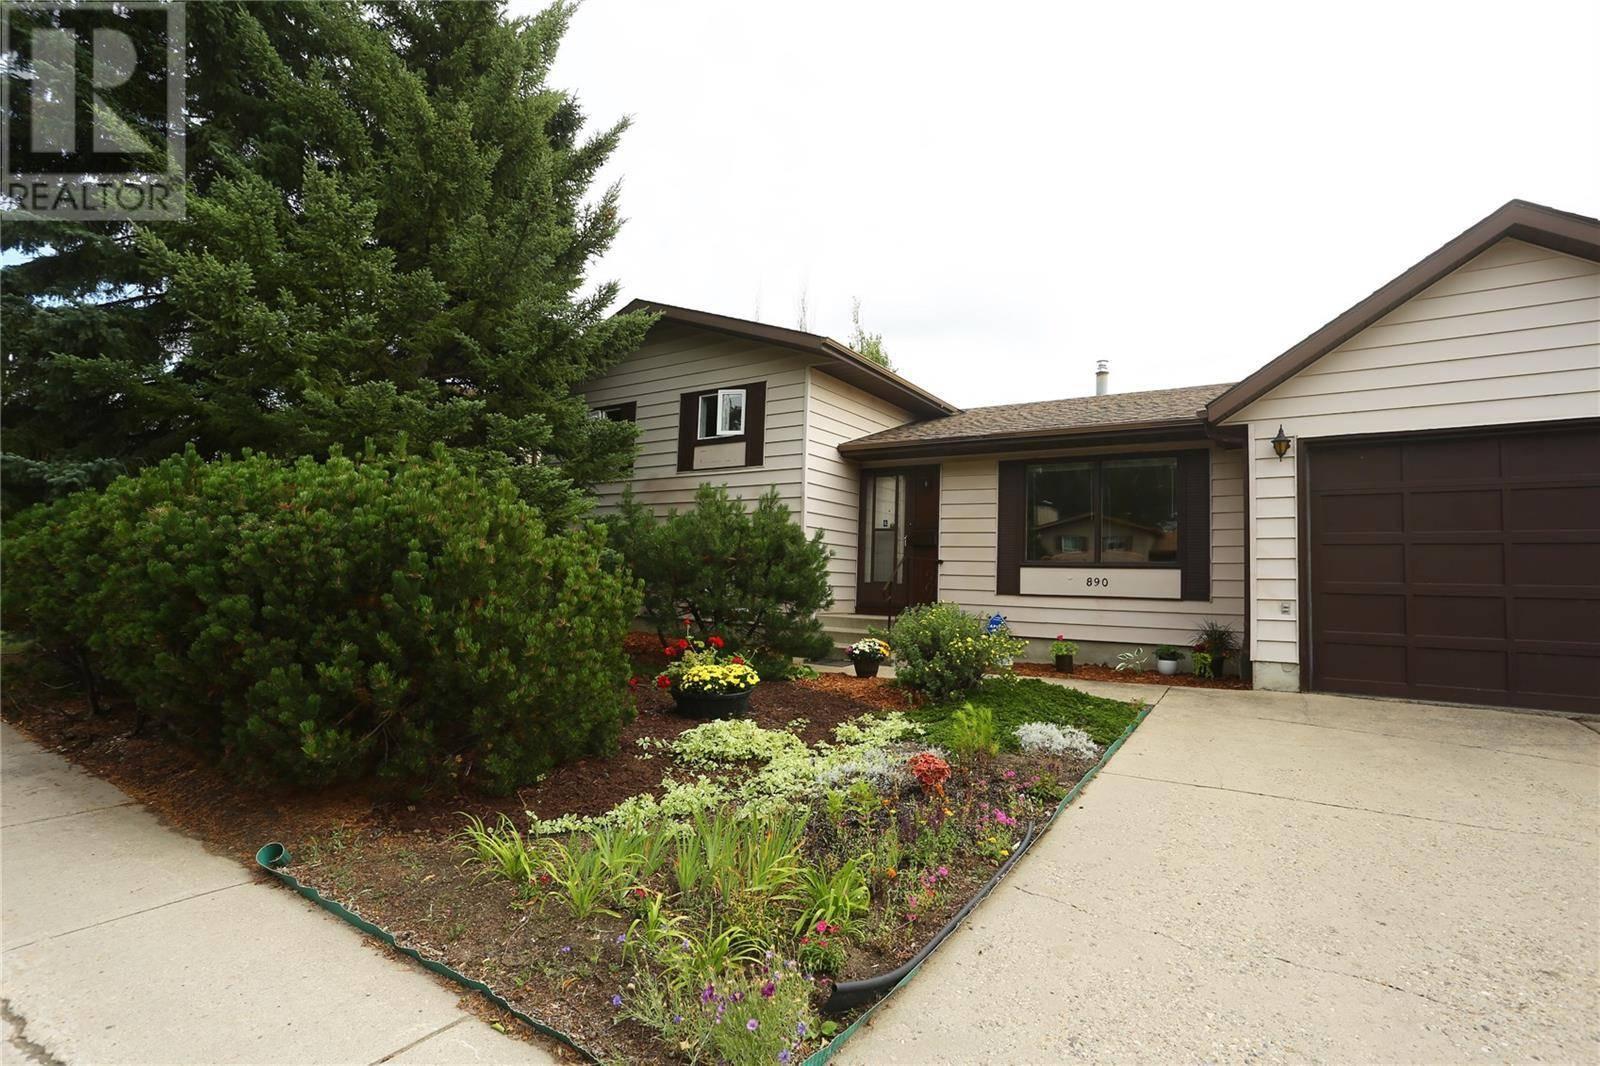 House for sale at 890 Kingsmere Blvd Saskatoon Saskatchewan - MLS: SK788981